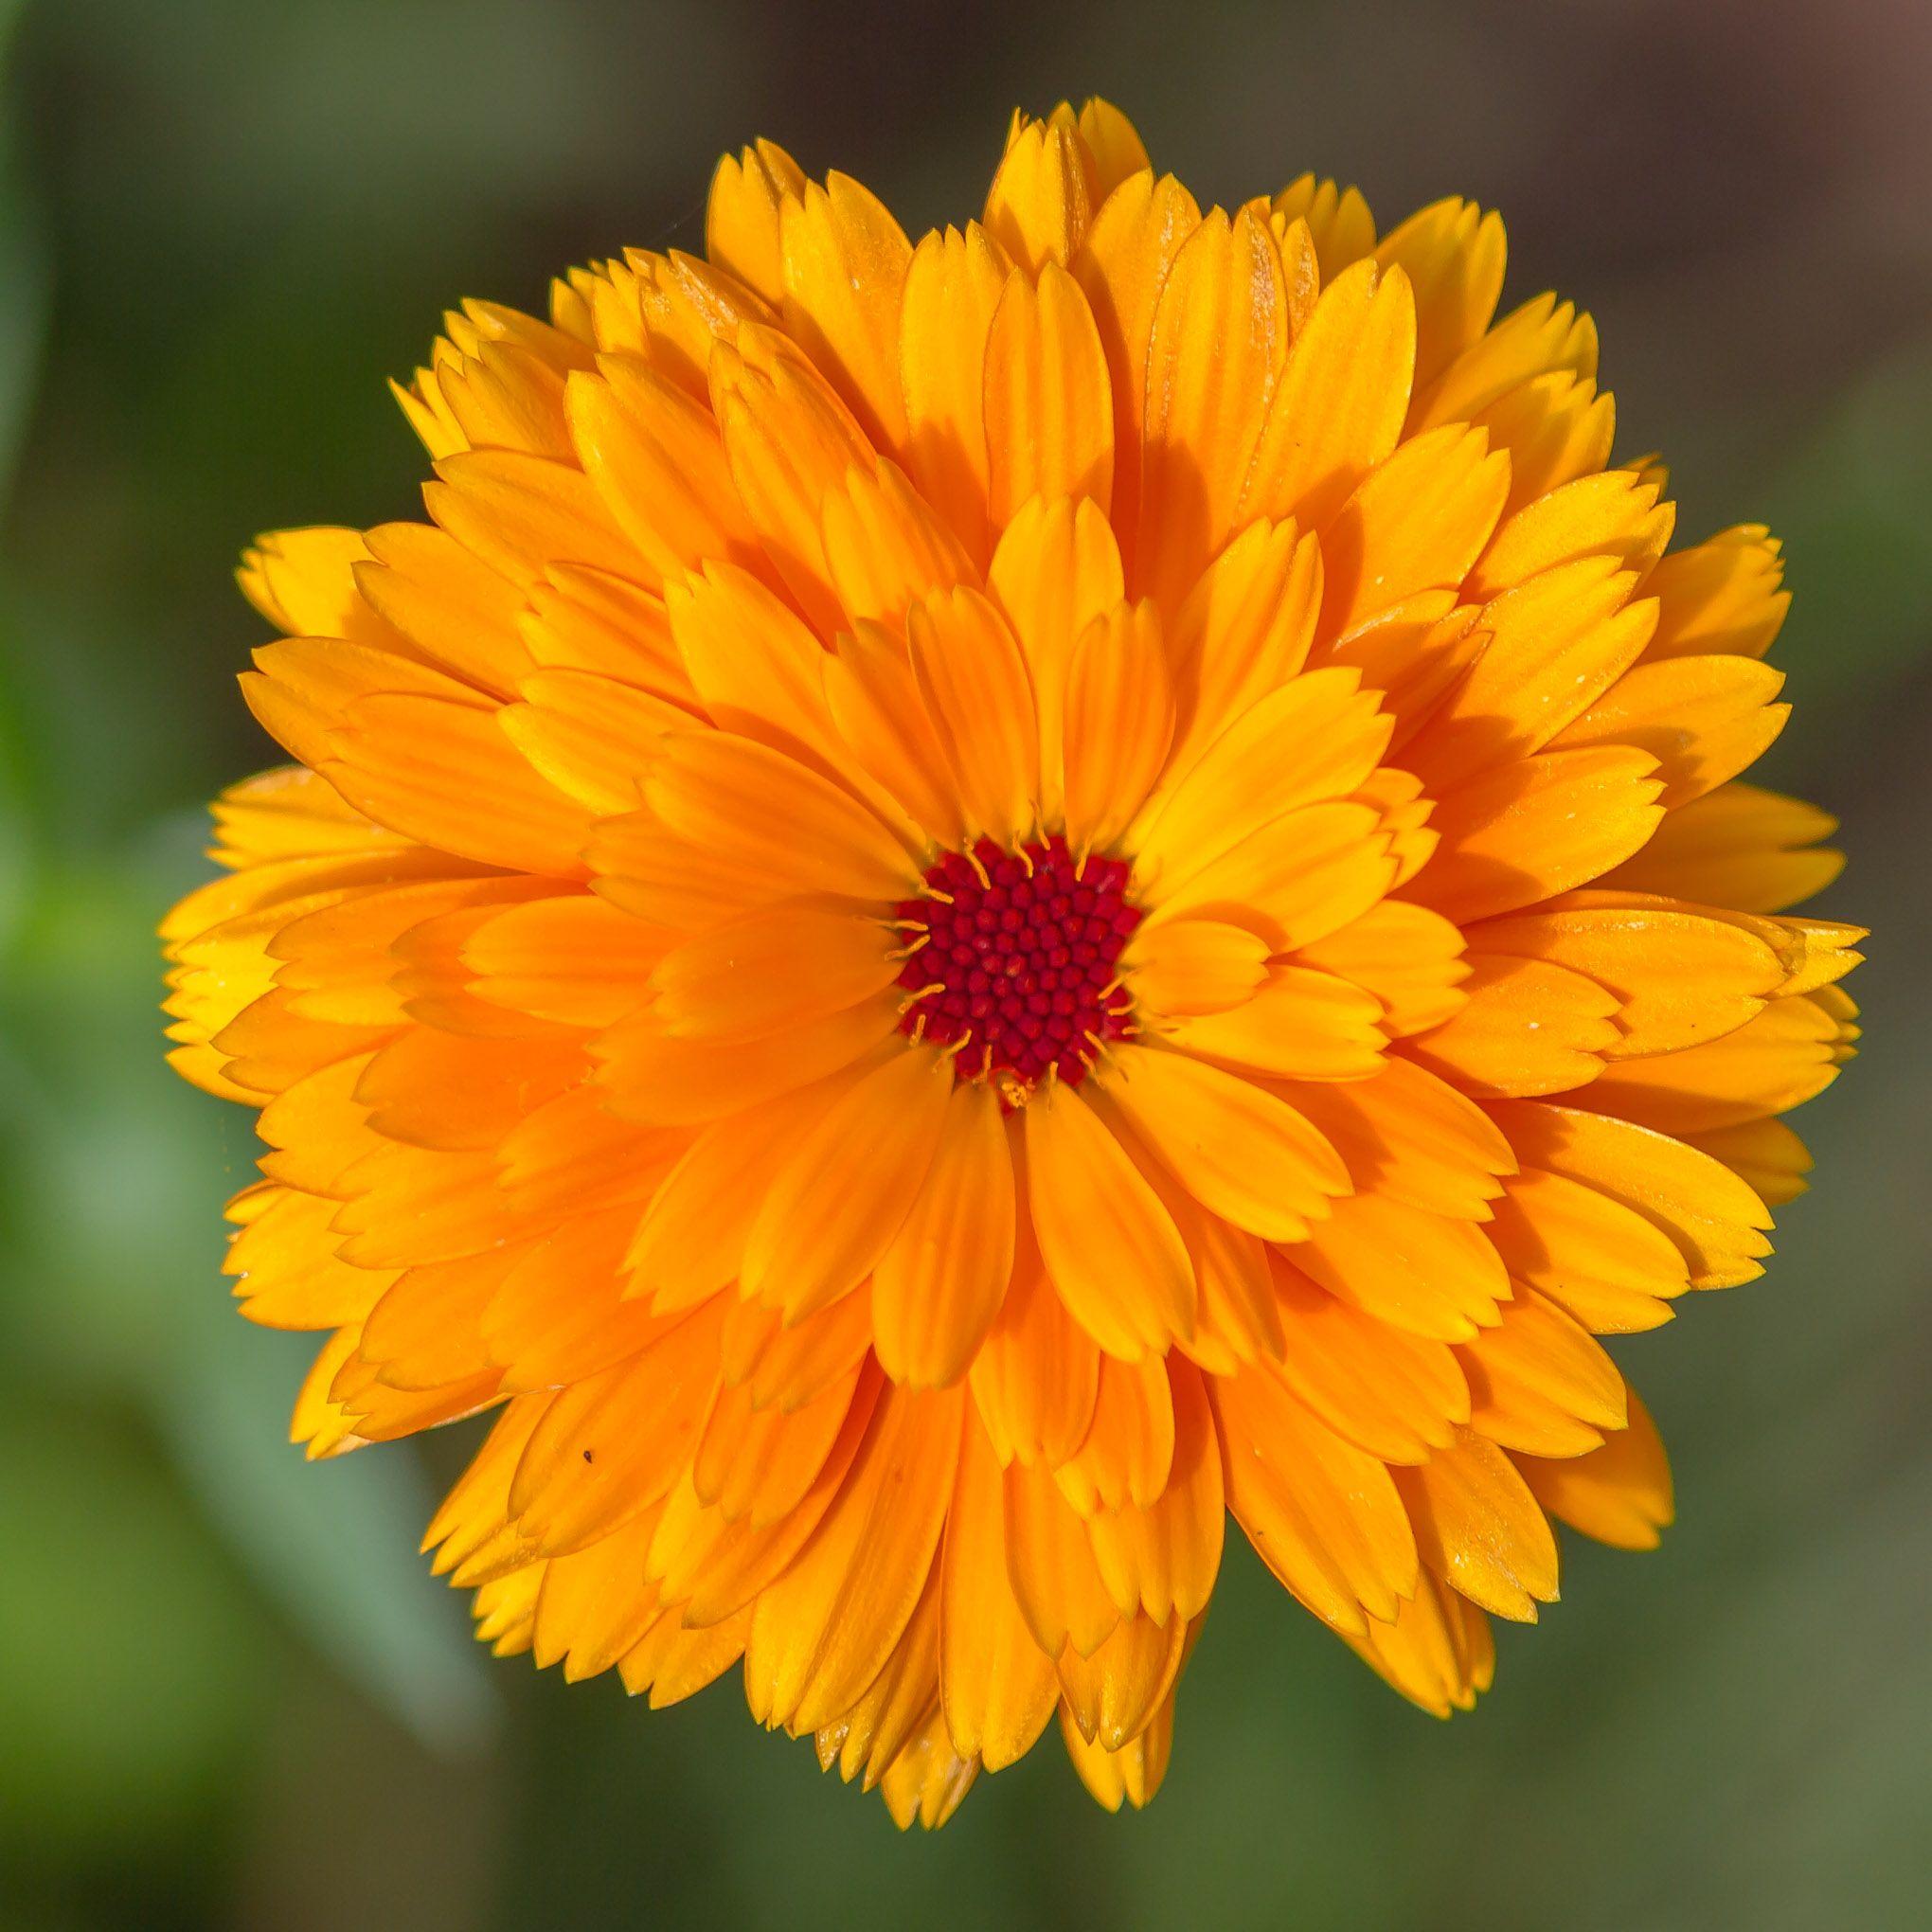 Pin by rosibel nieblas on Flor Pinterest Flowers Plants and Flora